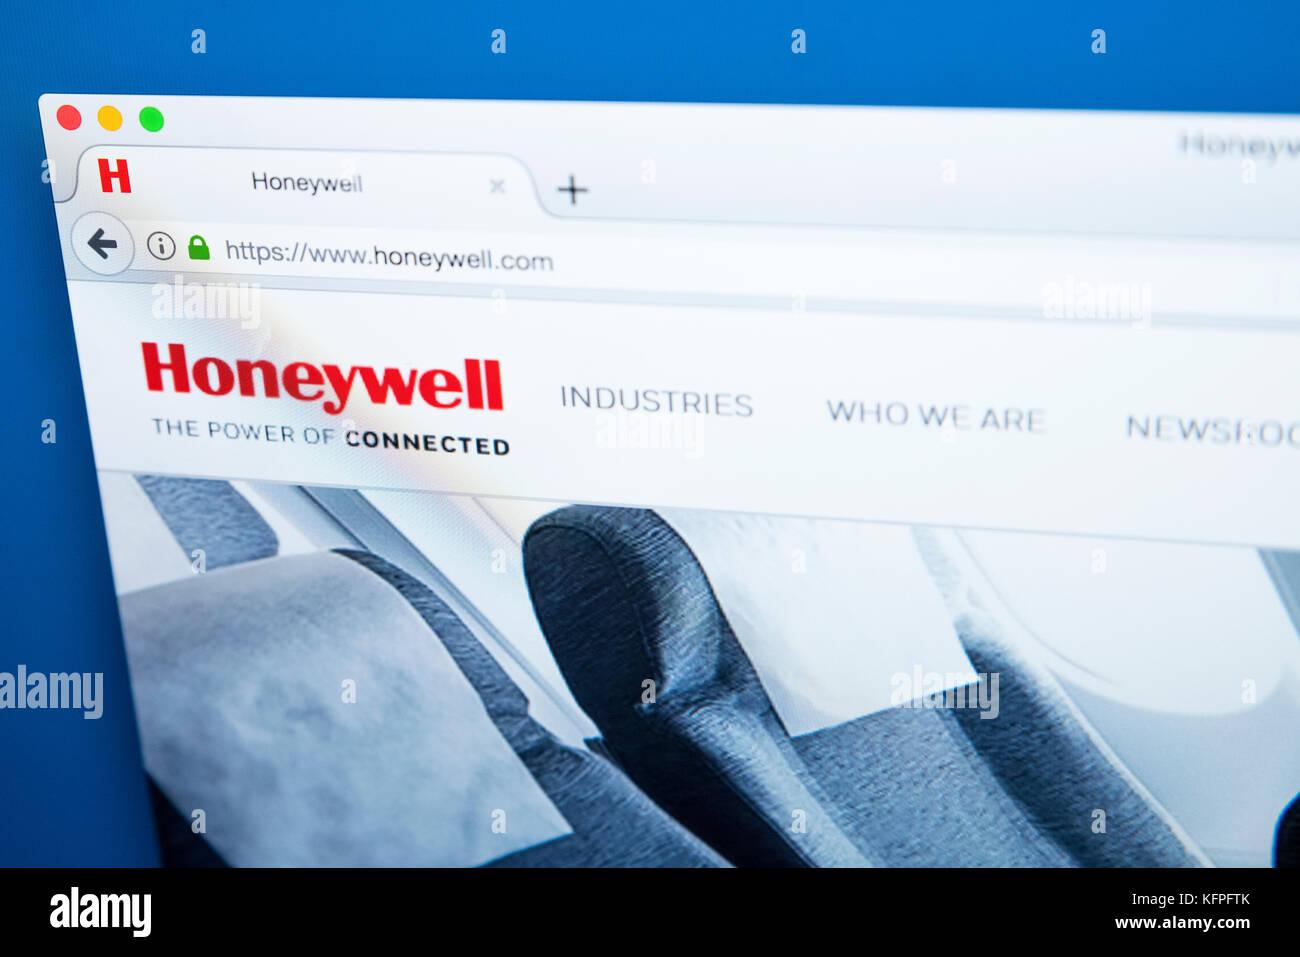 Honeywell Logo Stock Photos & Honeywell Logo Stock Images